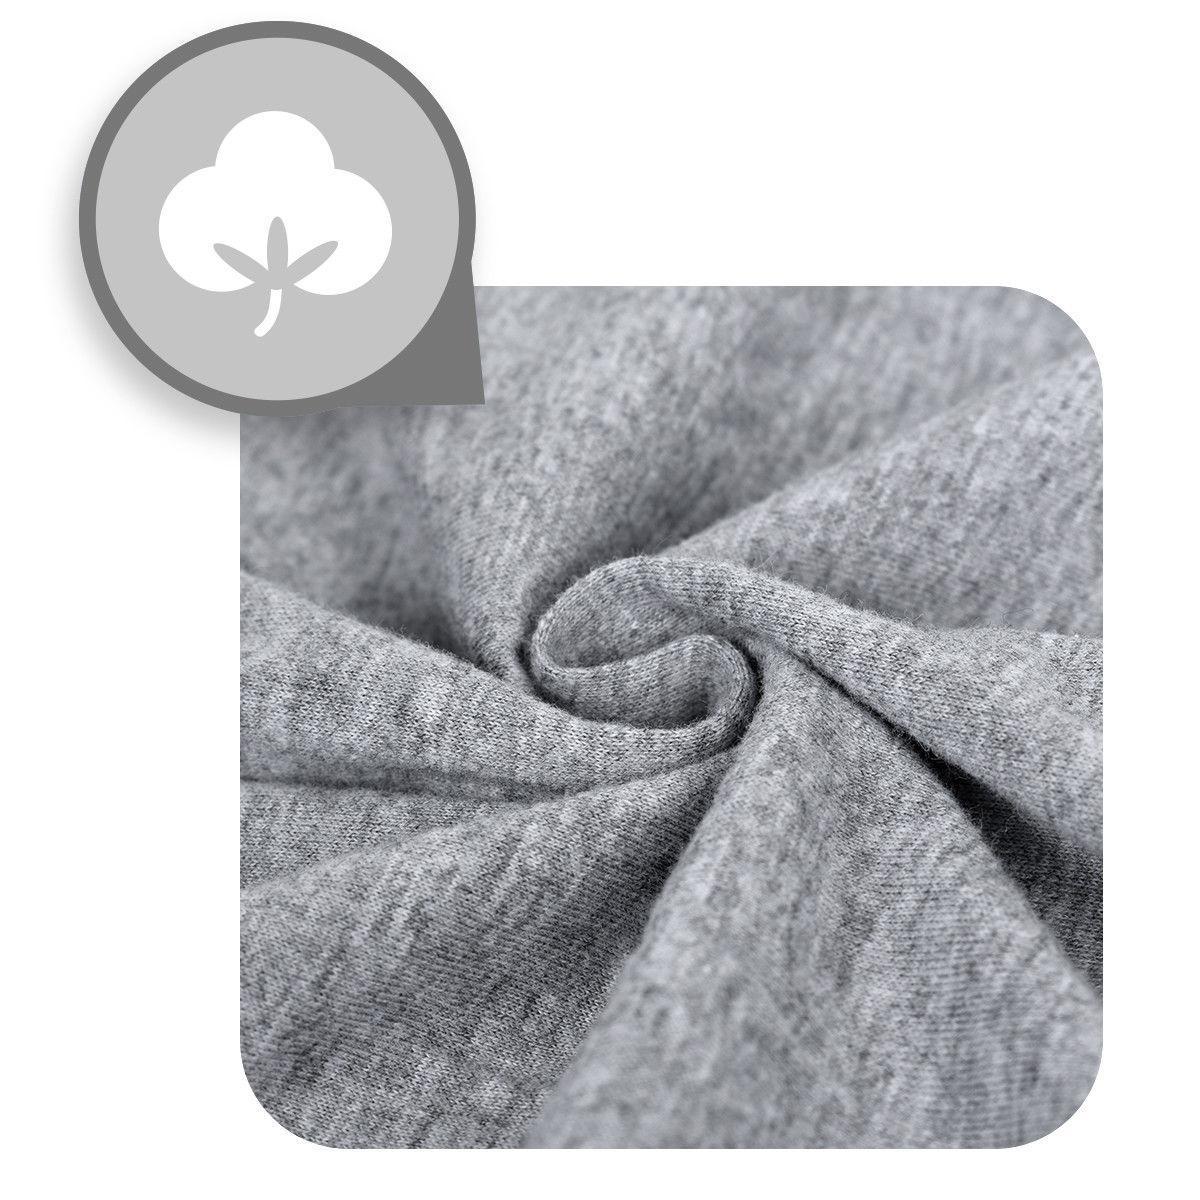 🔥 𝐅𝐀𝐒𝐓   U-Shaped Pillow, Body PharMeDoc